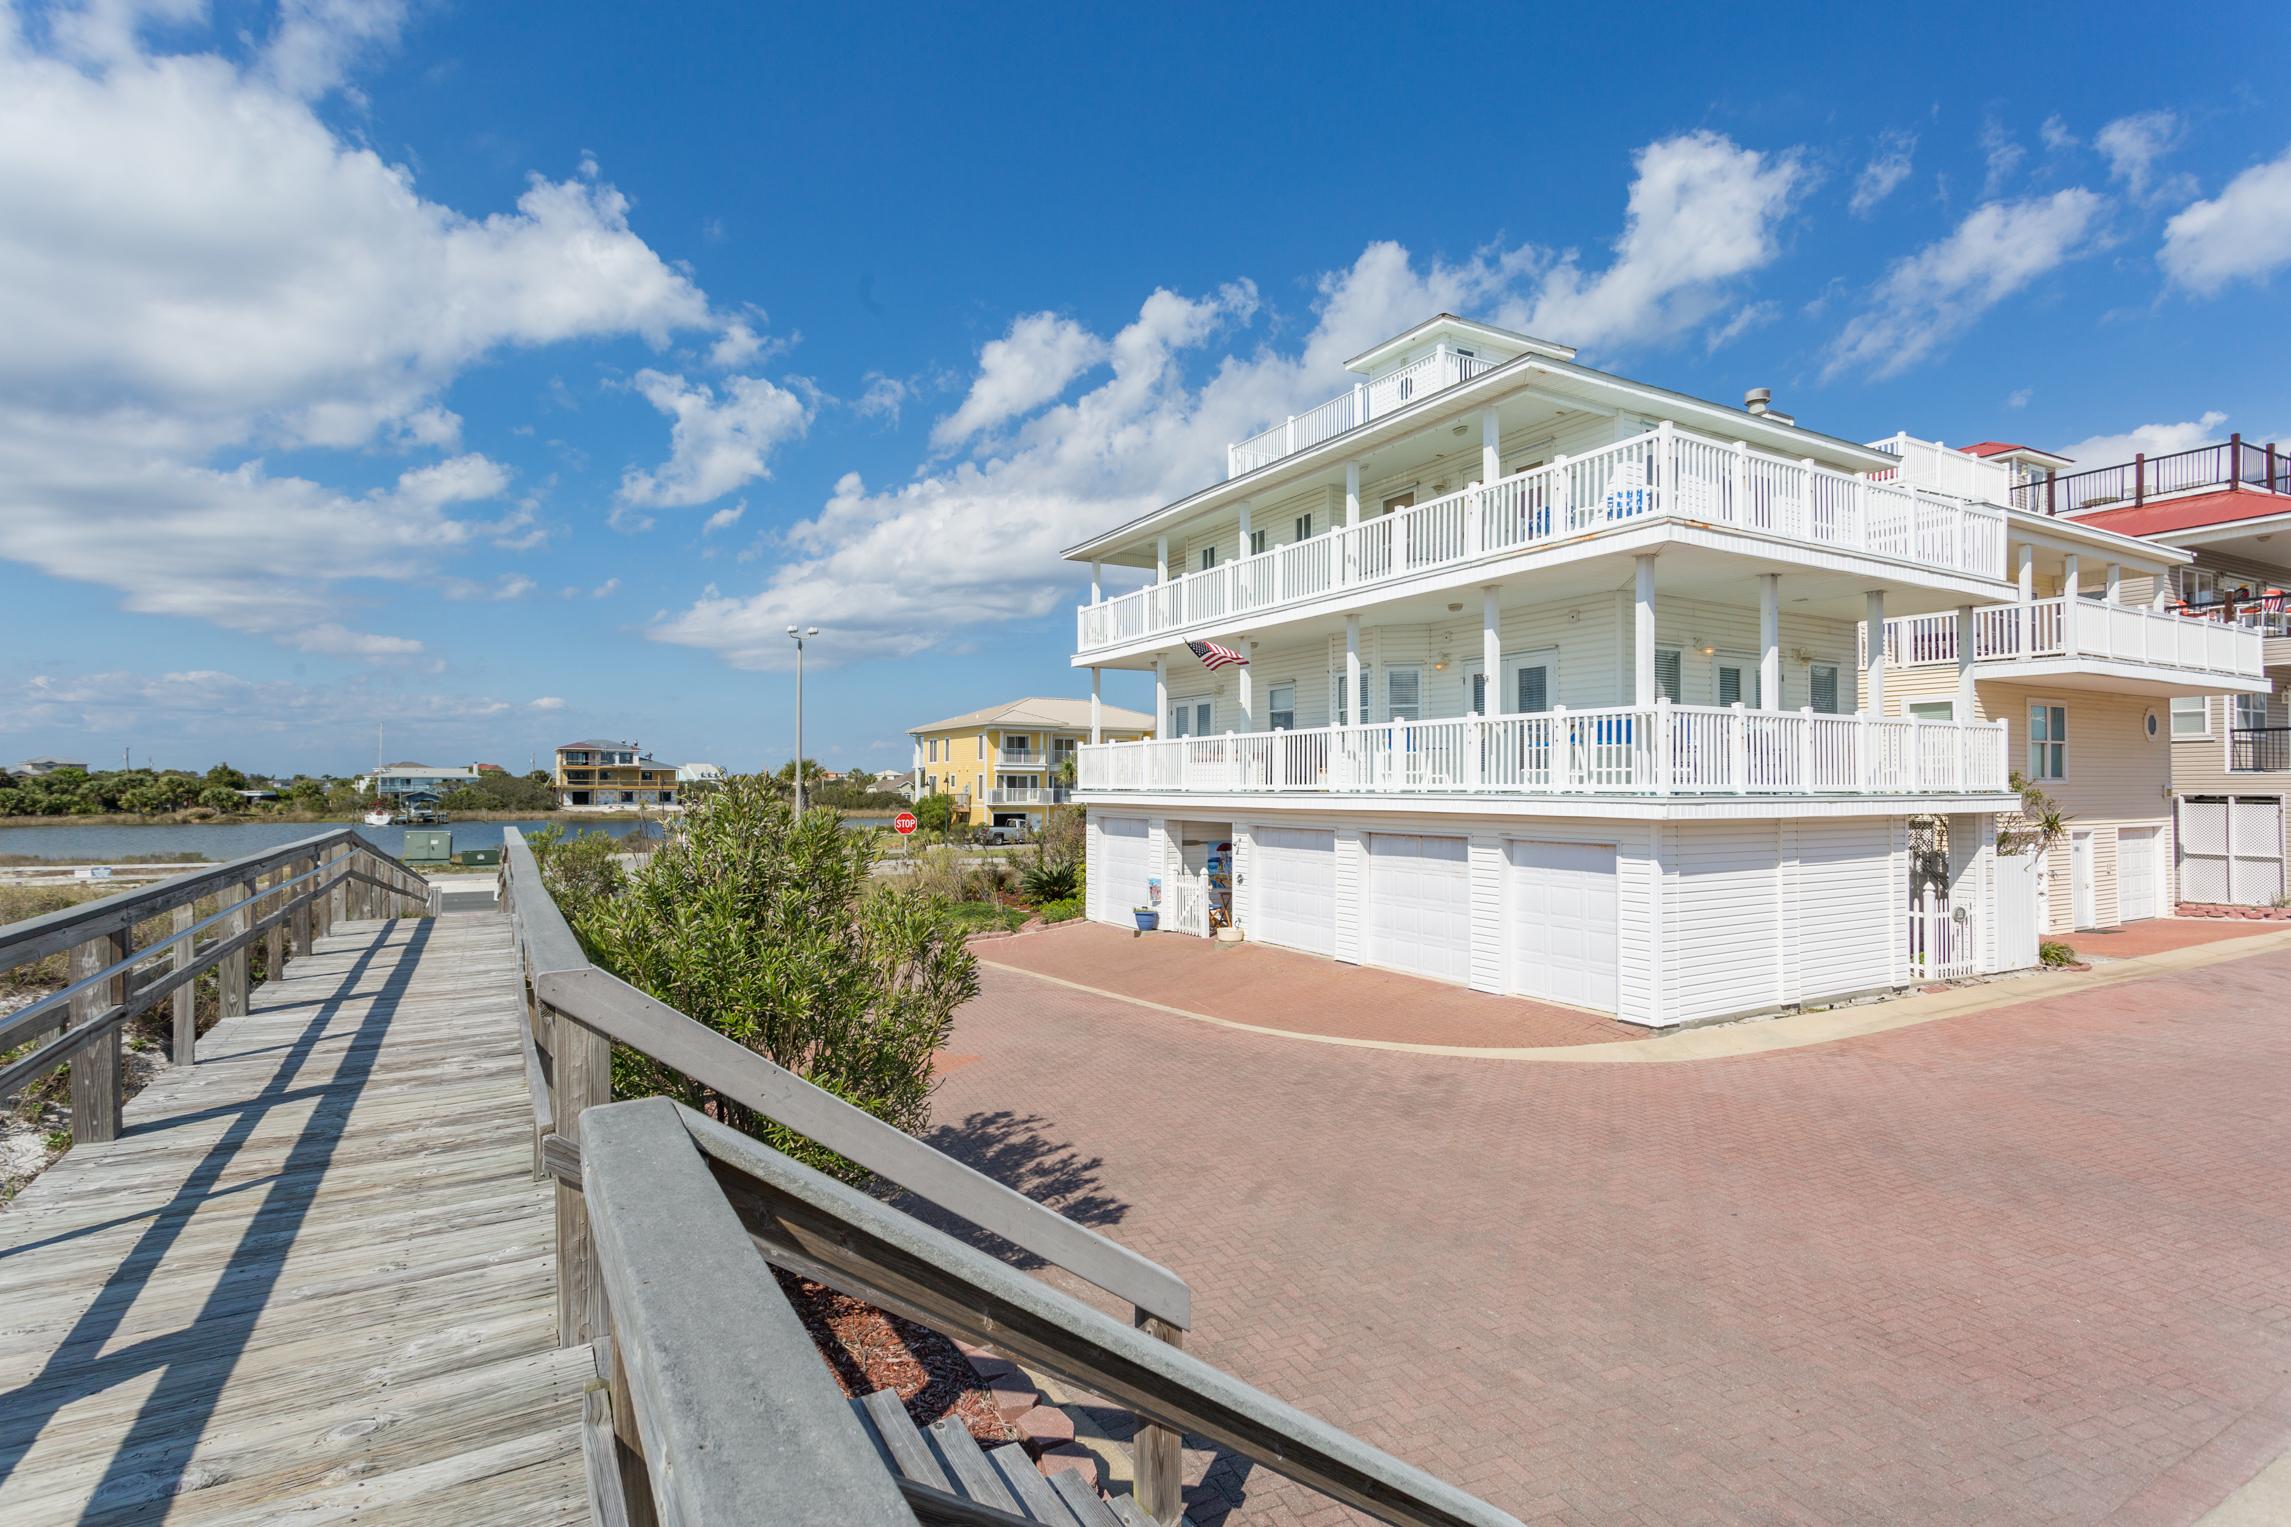 White Sands Cottage 501 Life's a Beach House Townhouse rental in White Sands Pensacola Beach in Pensacola Beach Florida - #49